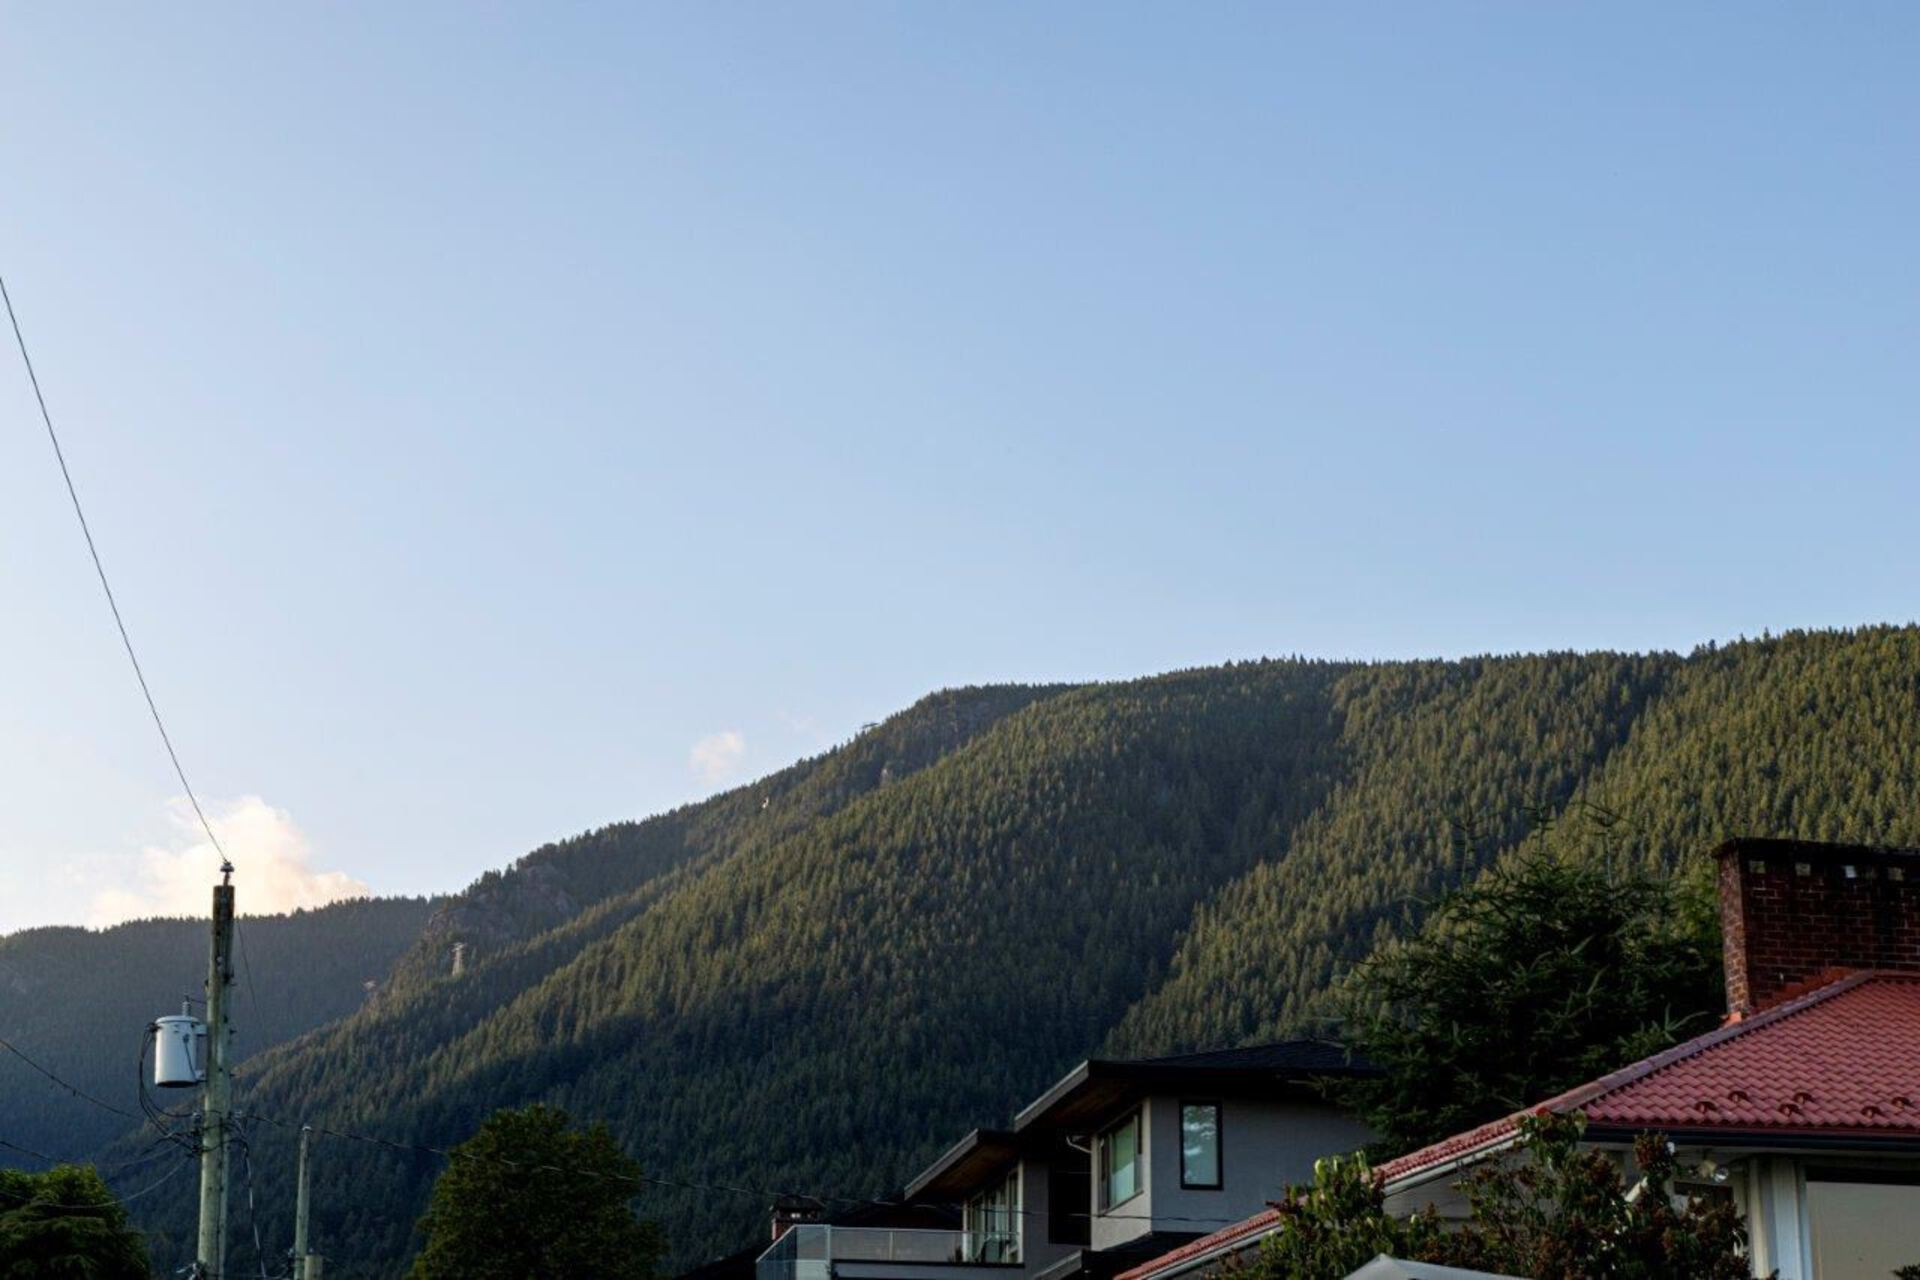 4367-ranger-avenue-forest-hills-nv-north-vancouver-31 at 4367 Ranger Avenue, Forest Hills NV, North Vancouver